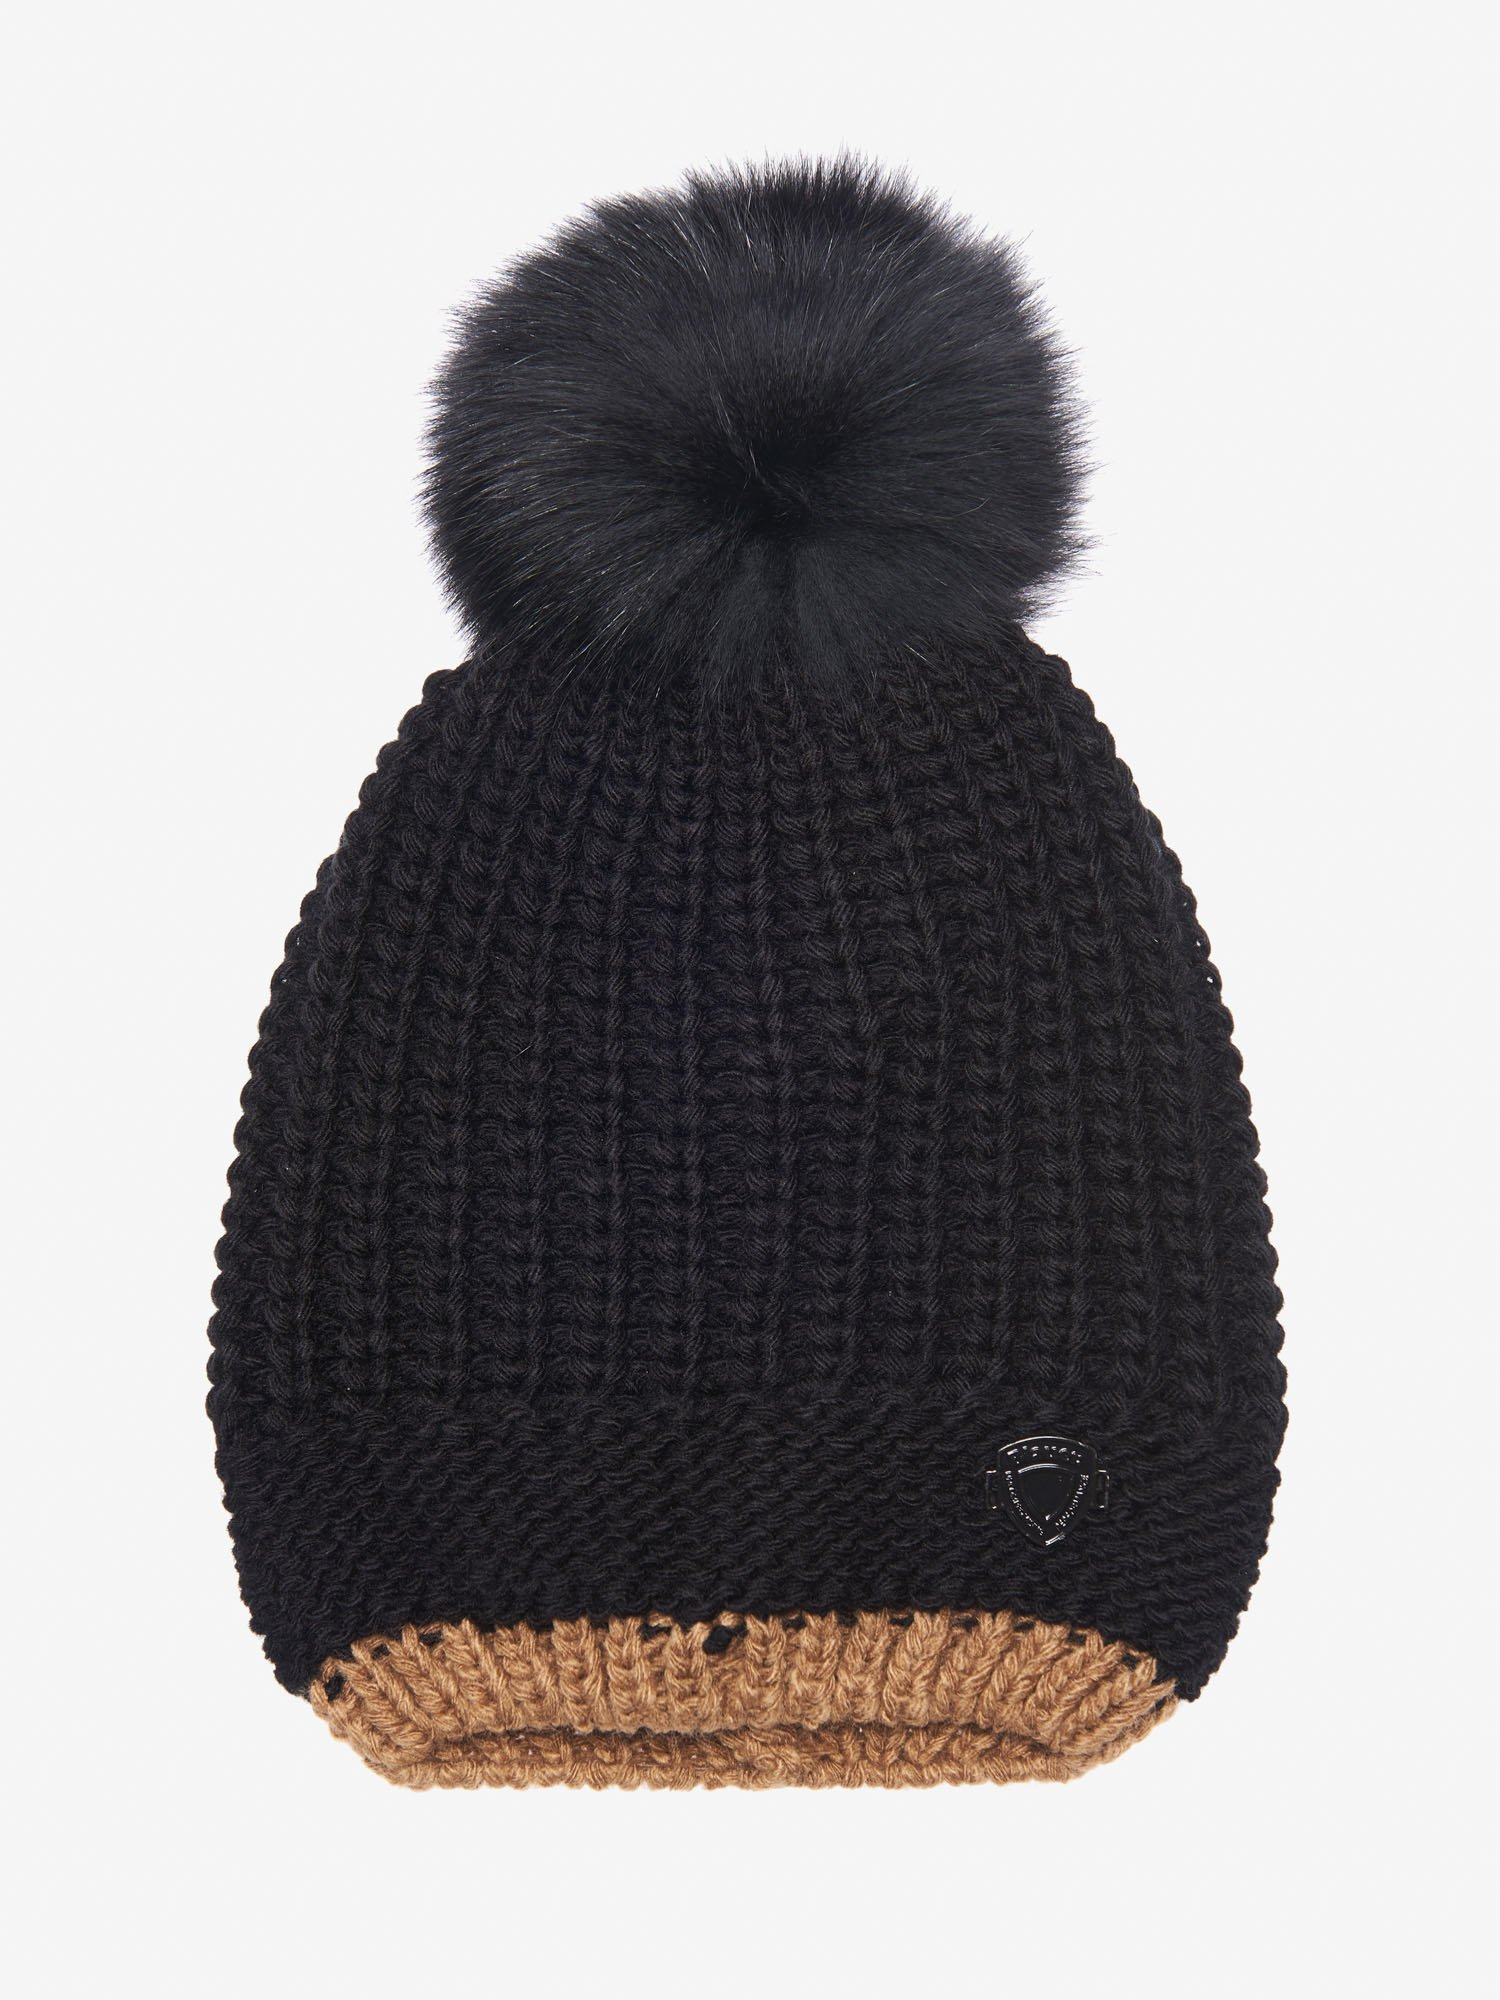 Blauer - JUNIOR CAP WITH POM POM - Black - Blauer